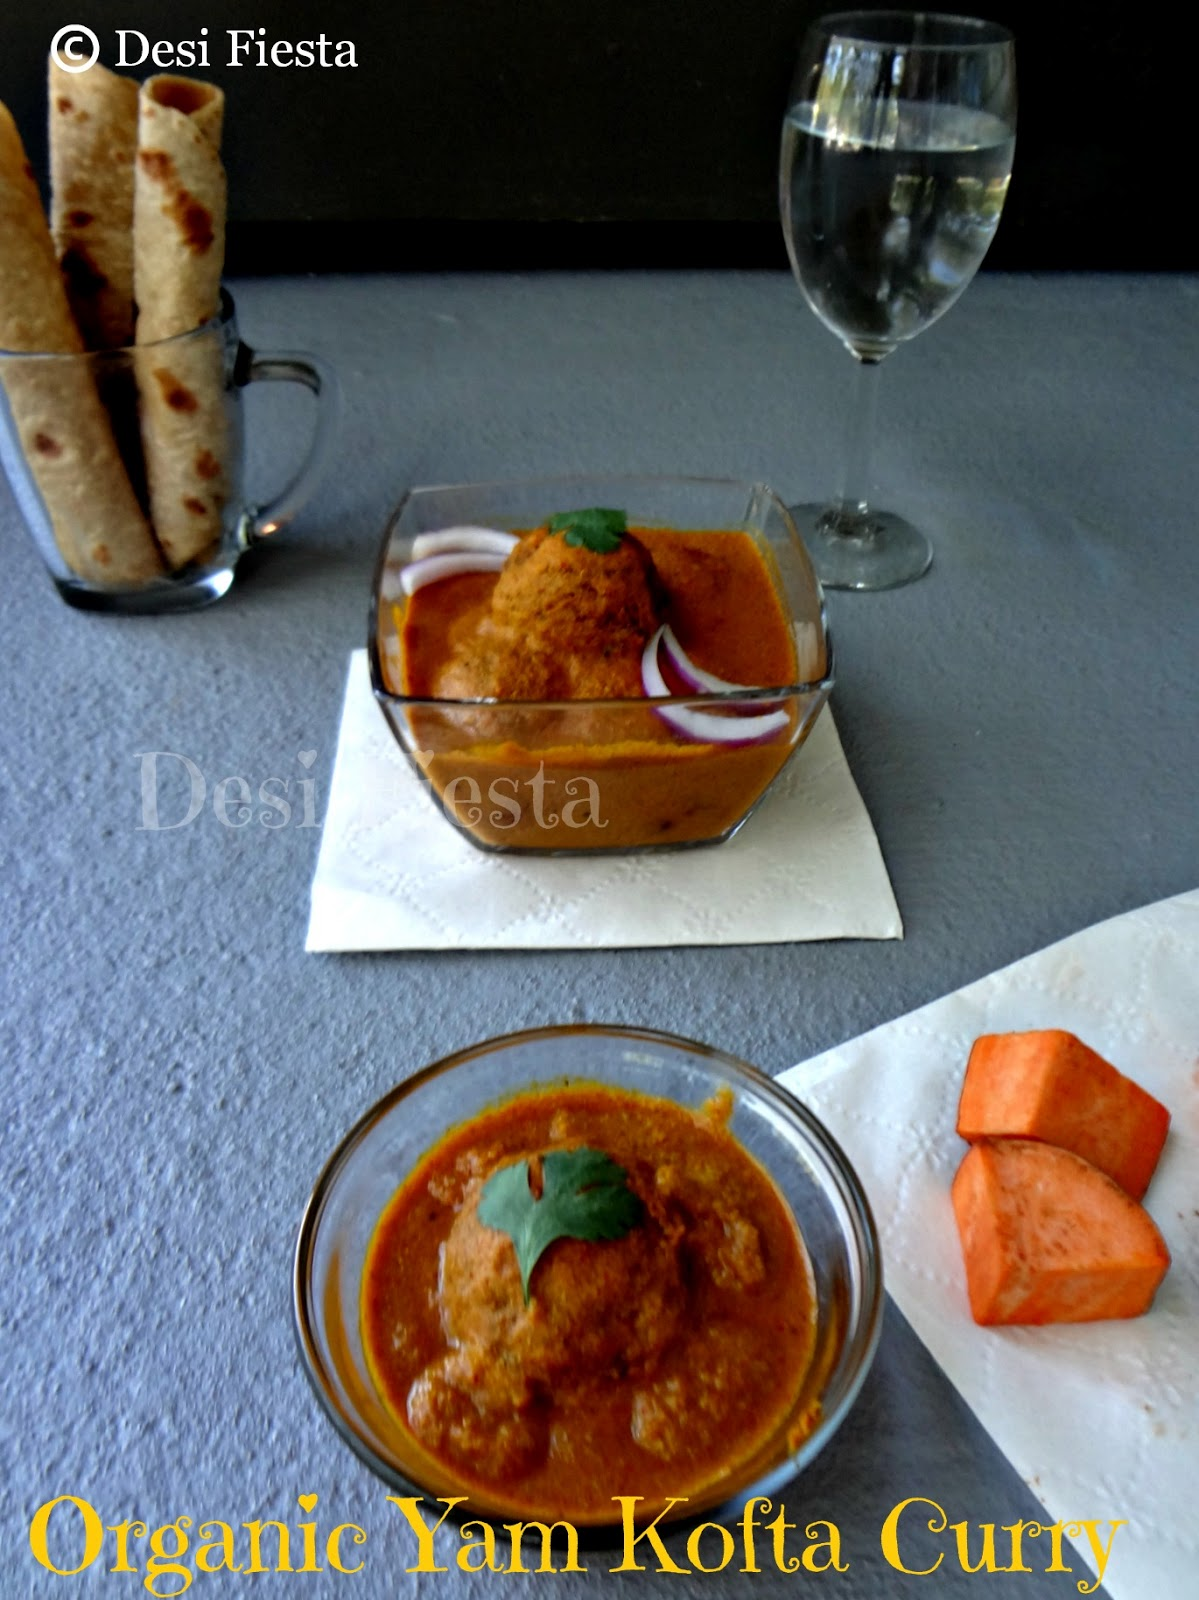 Organic Yam Kofta curry - Desi Fiesta